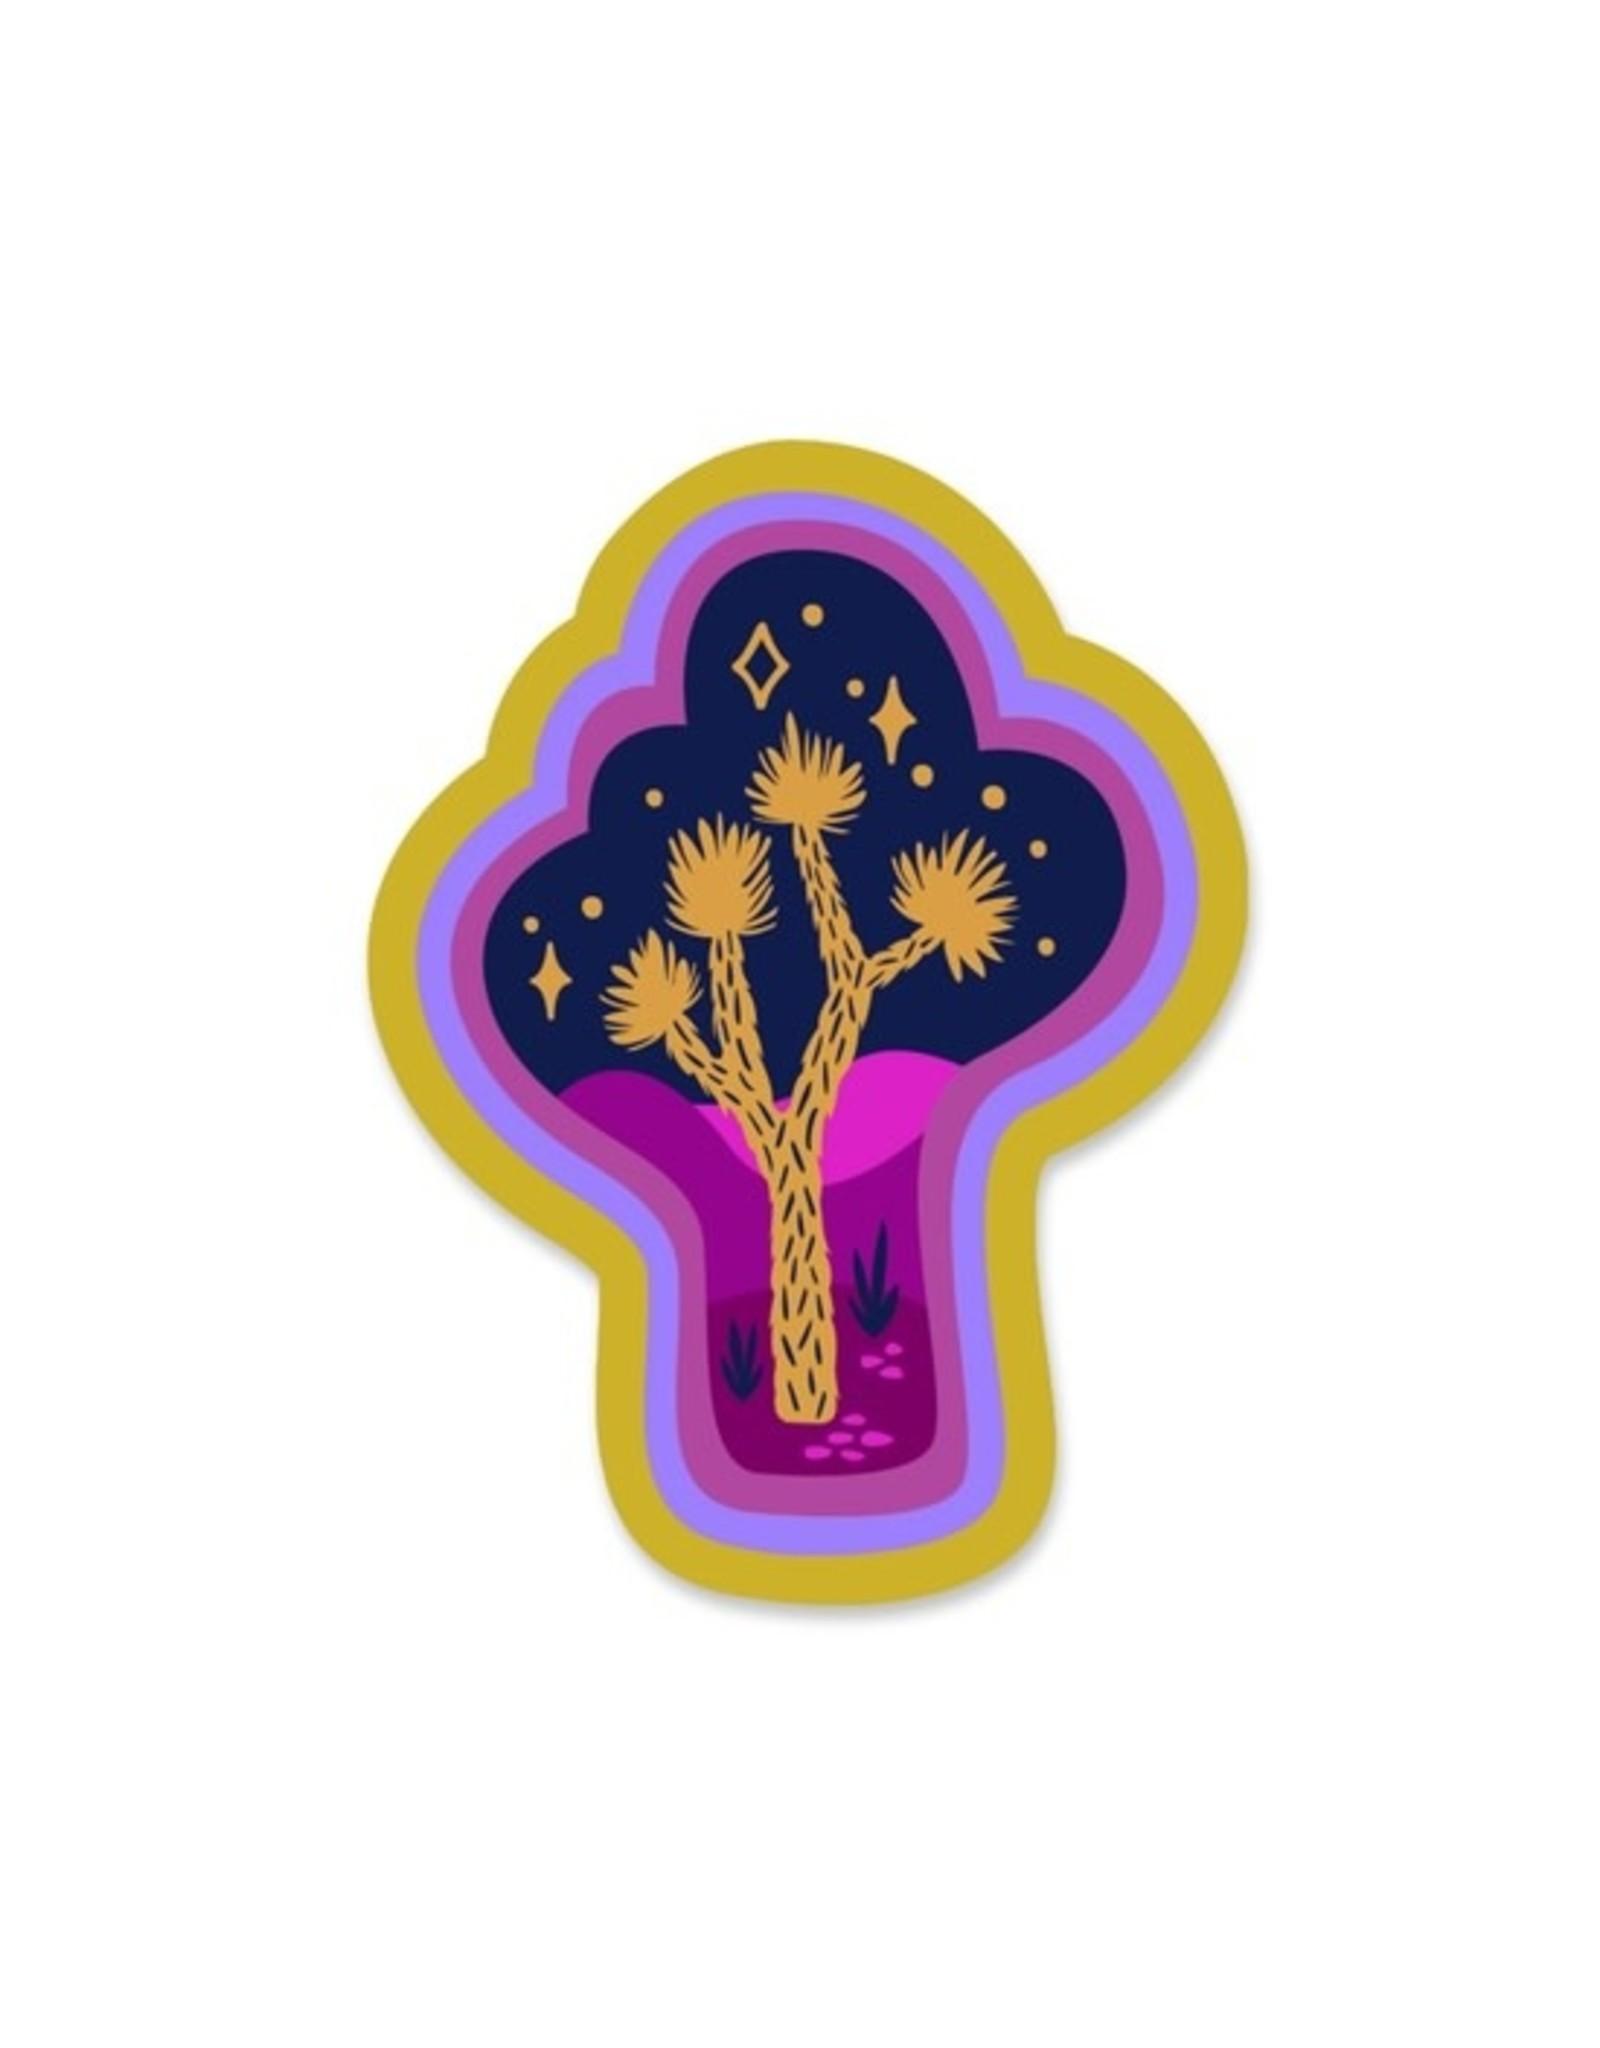 Paper Parasol Press Joshua Tree Magic Sticker